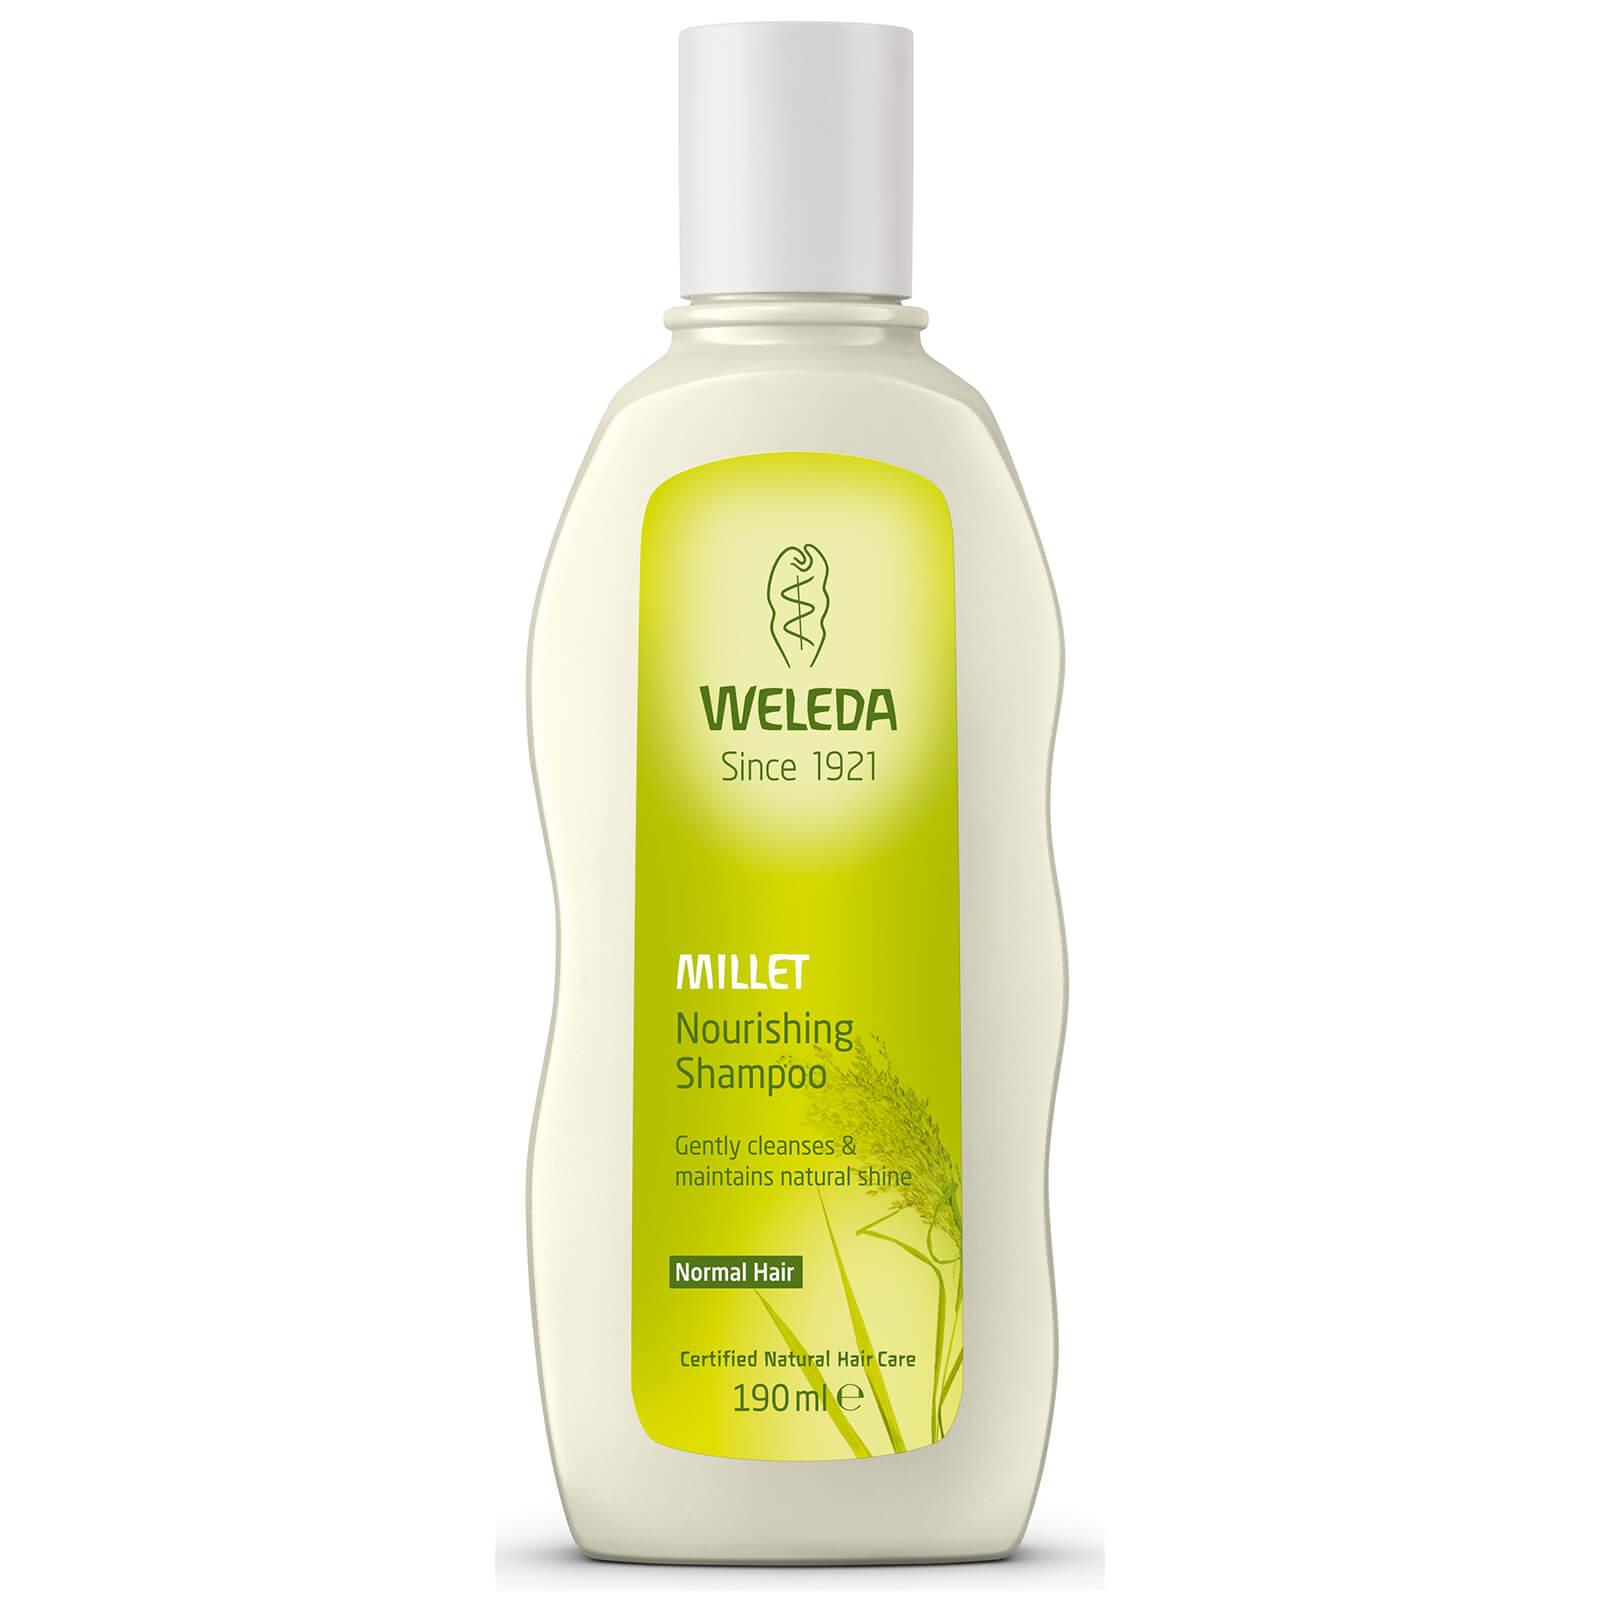 Weleda Millet Nourishing Shampoo (190 ml)